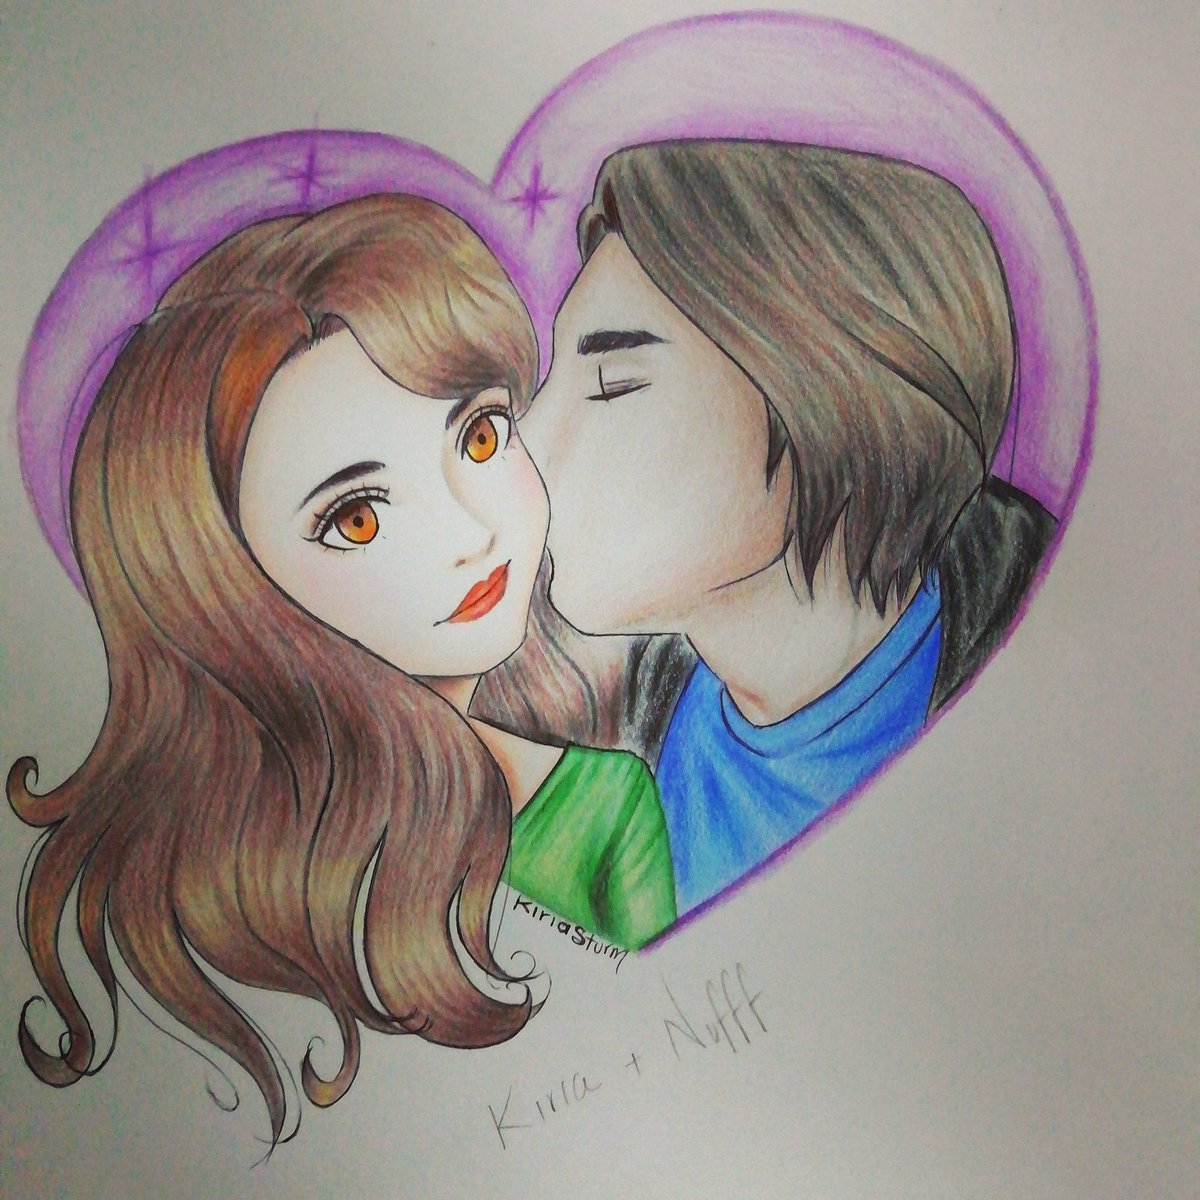 K+N  #kiss #girl #boy #couple #green #blue #oneheart #twosouls #orangelips #stars #draw #colors #beso #chica #chico #pareja #verde #azul #uncorazón #dosalmas #labiosnaranja #estrellas #morado #dibujo #colores https://t.co/2ivP5TGC4j